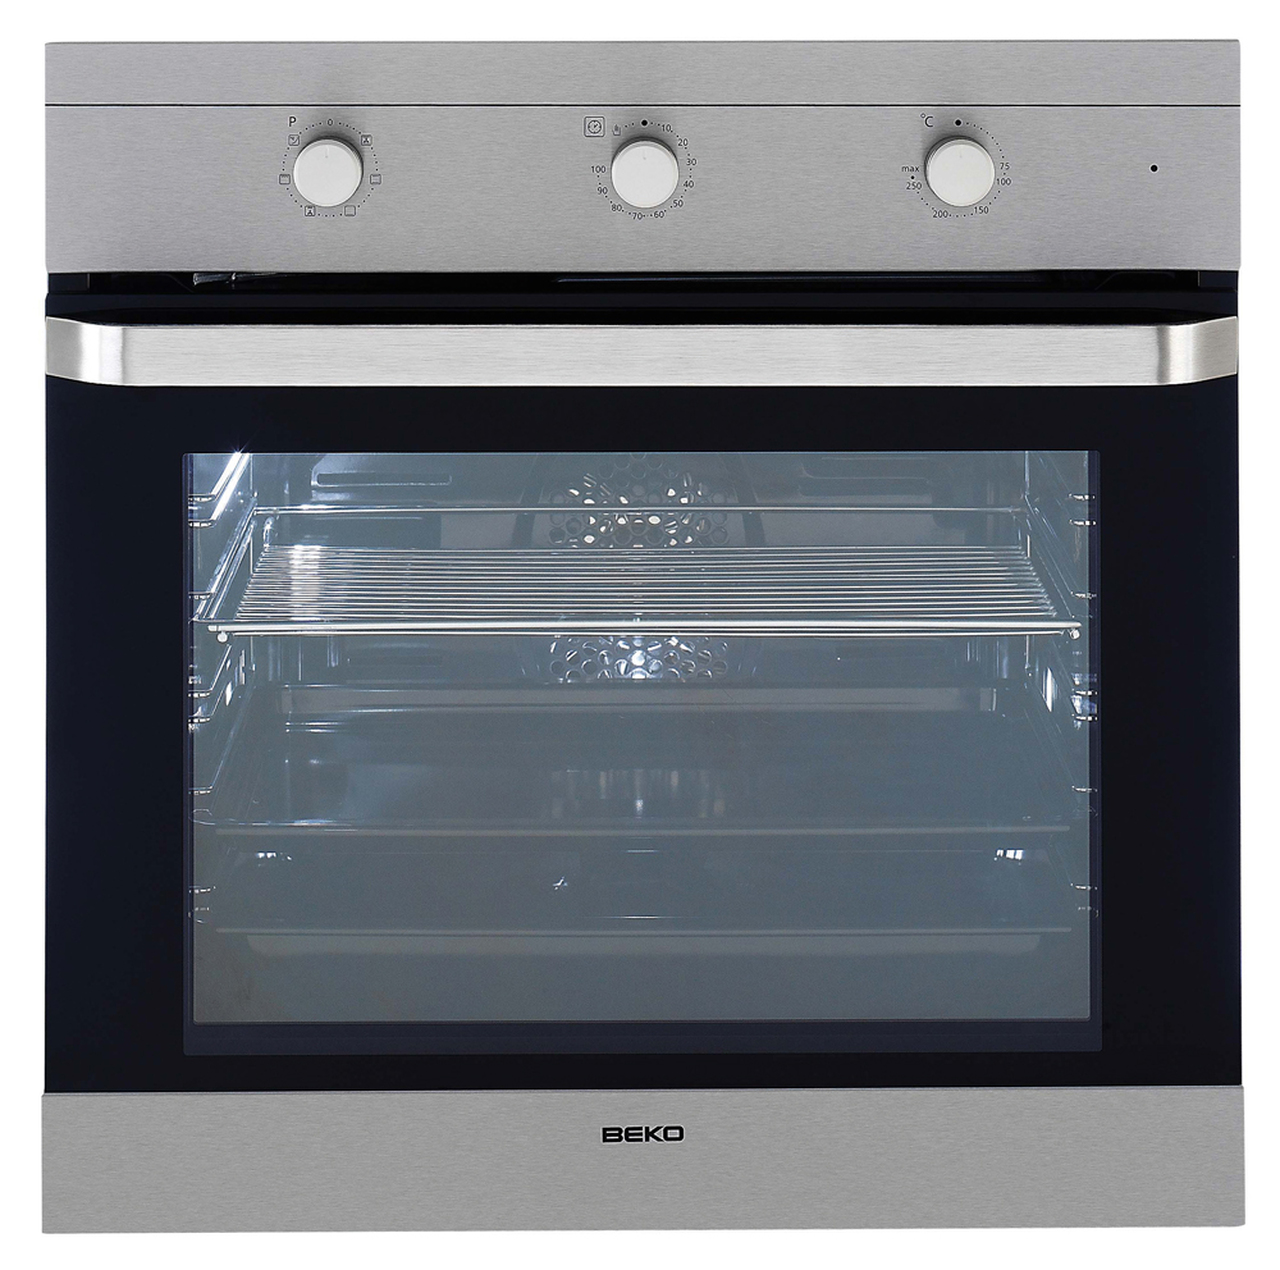 Beko Multifunction Electric Oven OIM22101X